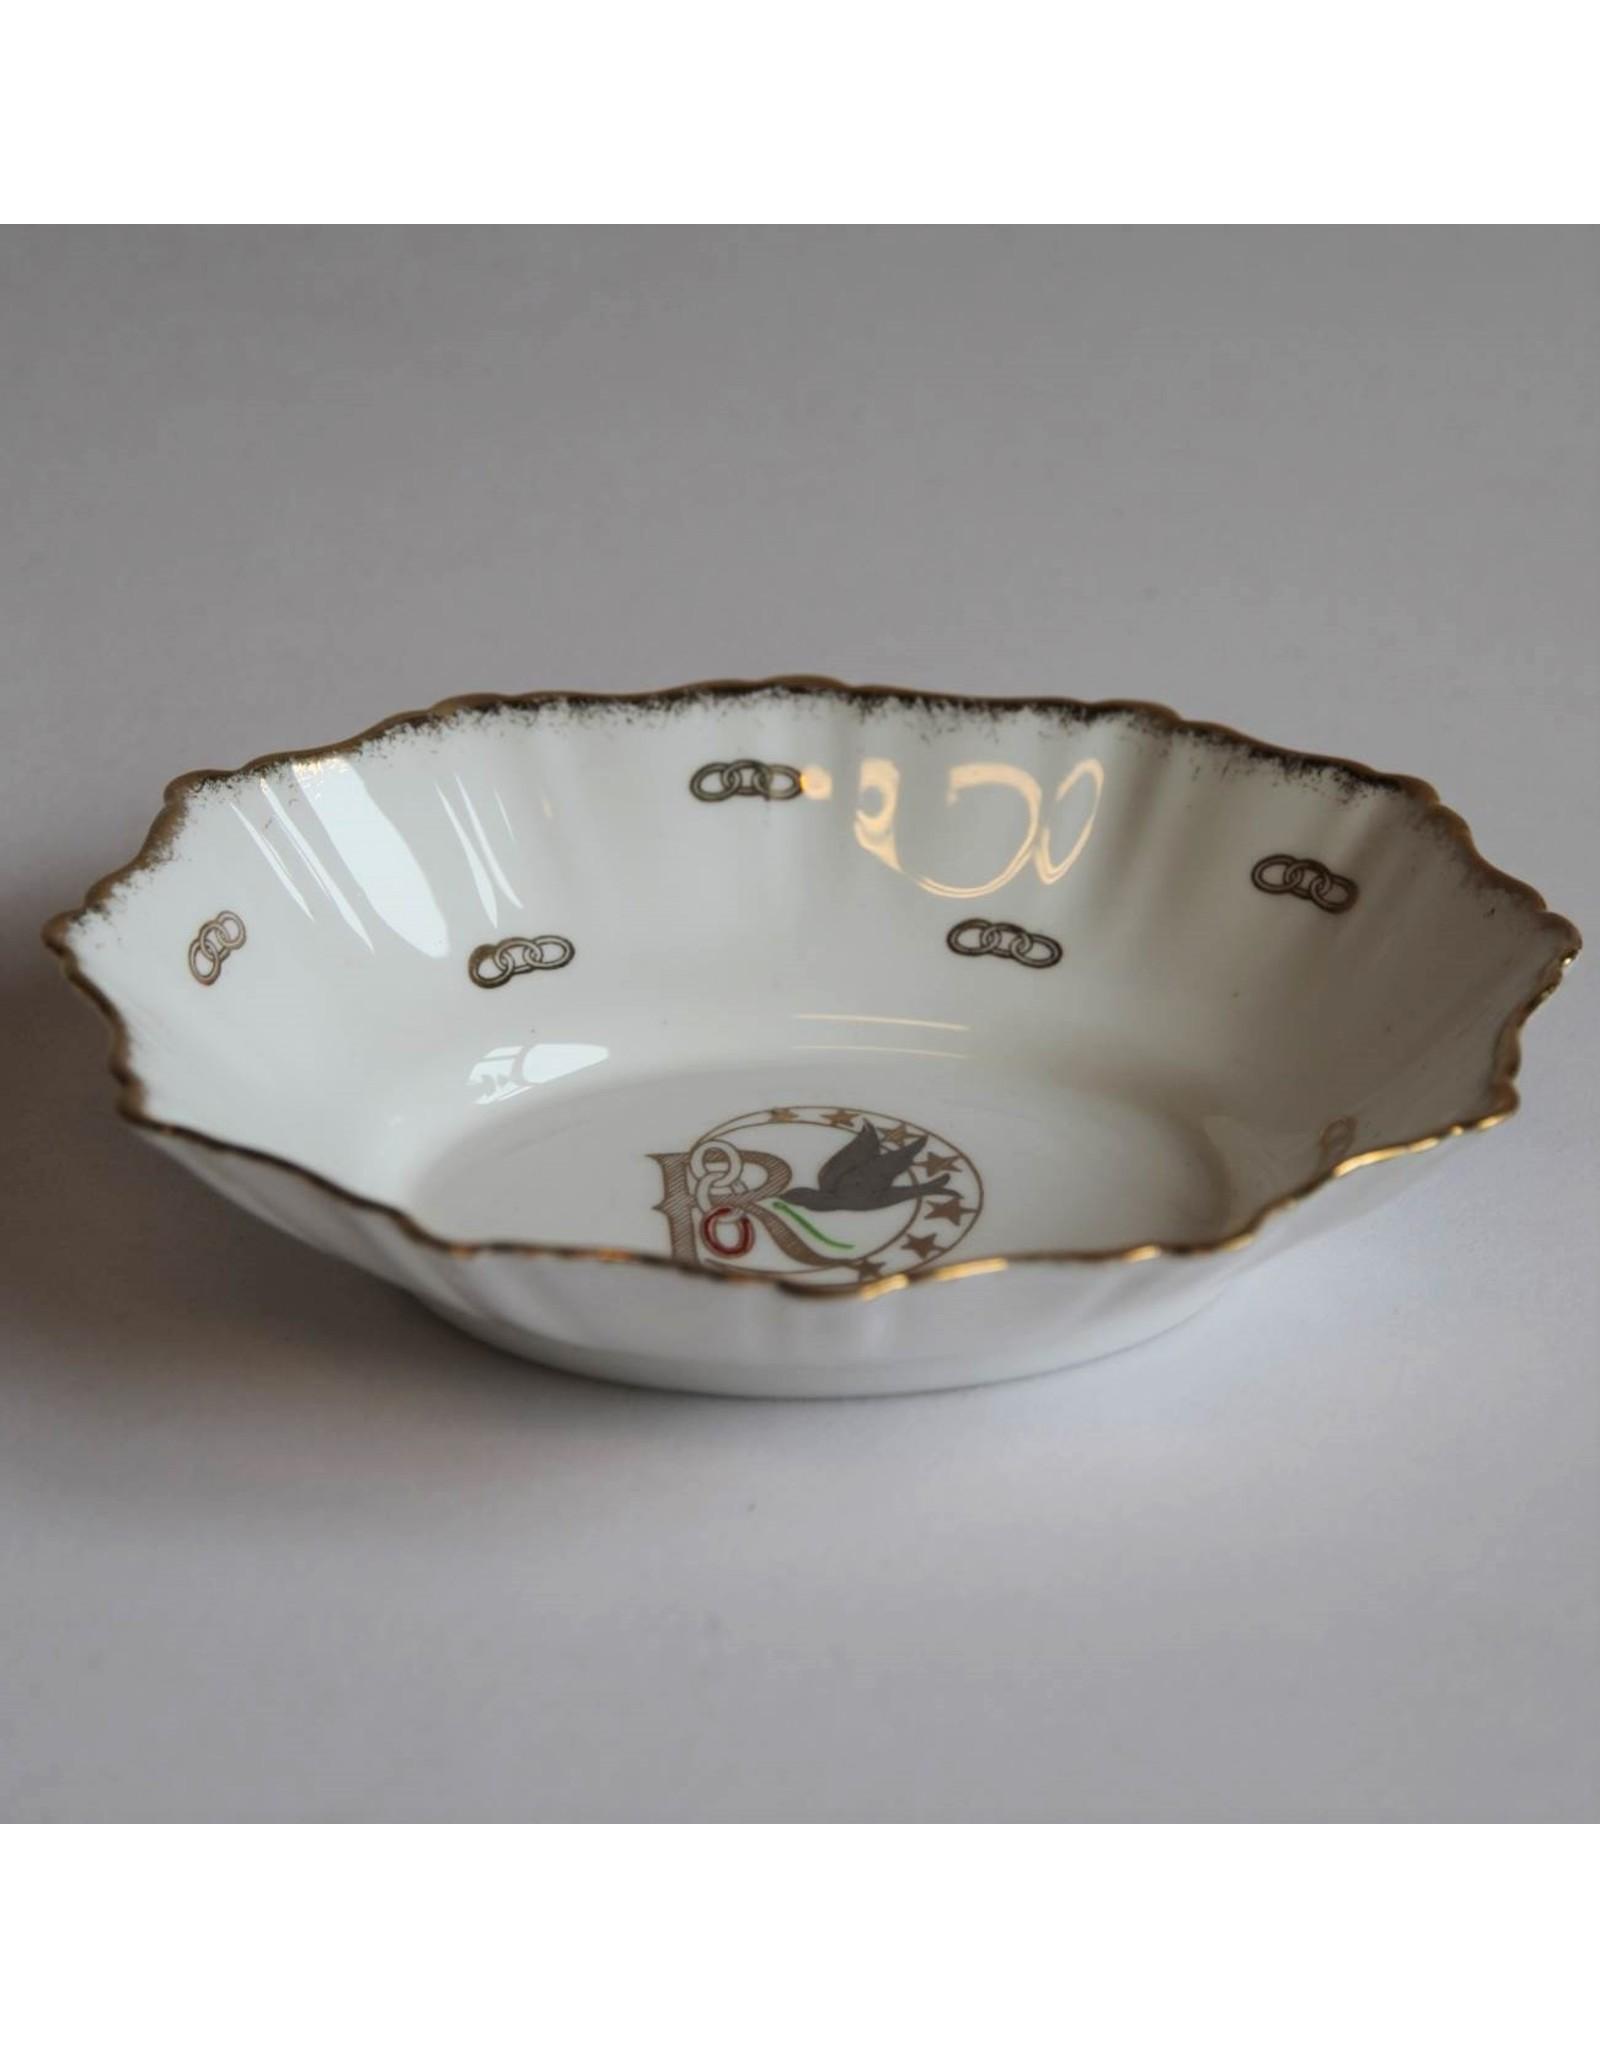 Bon bon dish - Daughters of Rebekah, International Order of Odd Fellows, Royal Stafford bone china